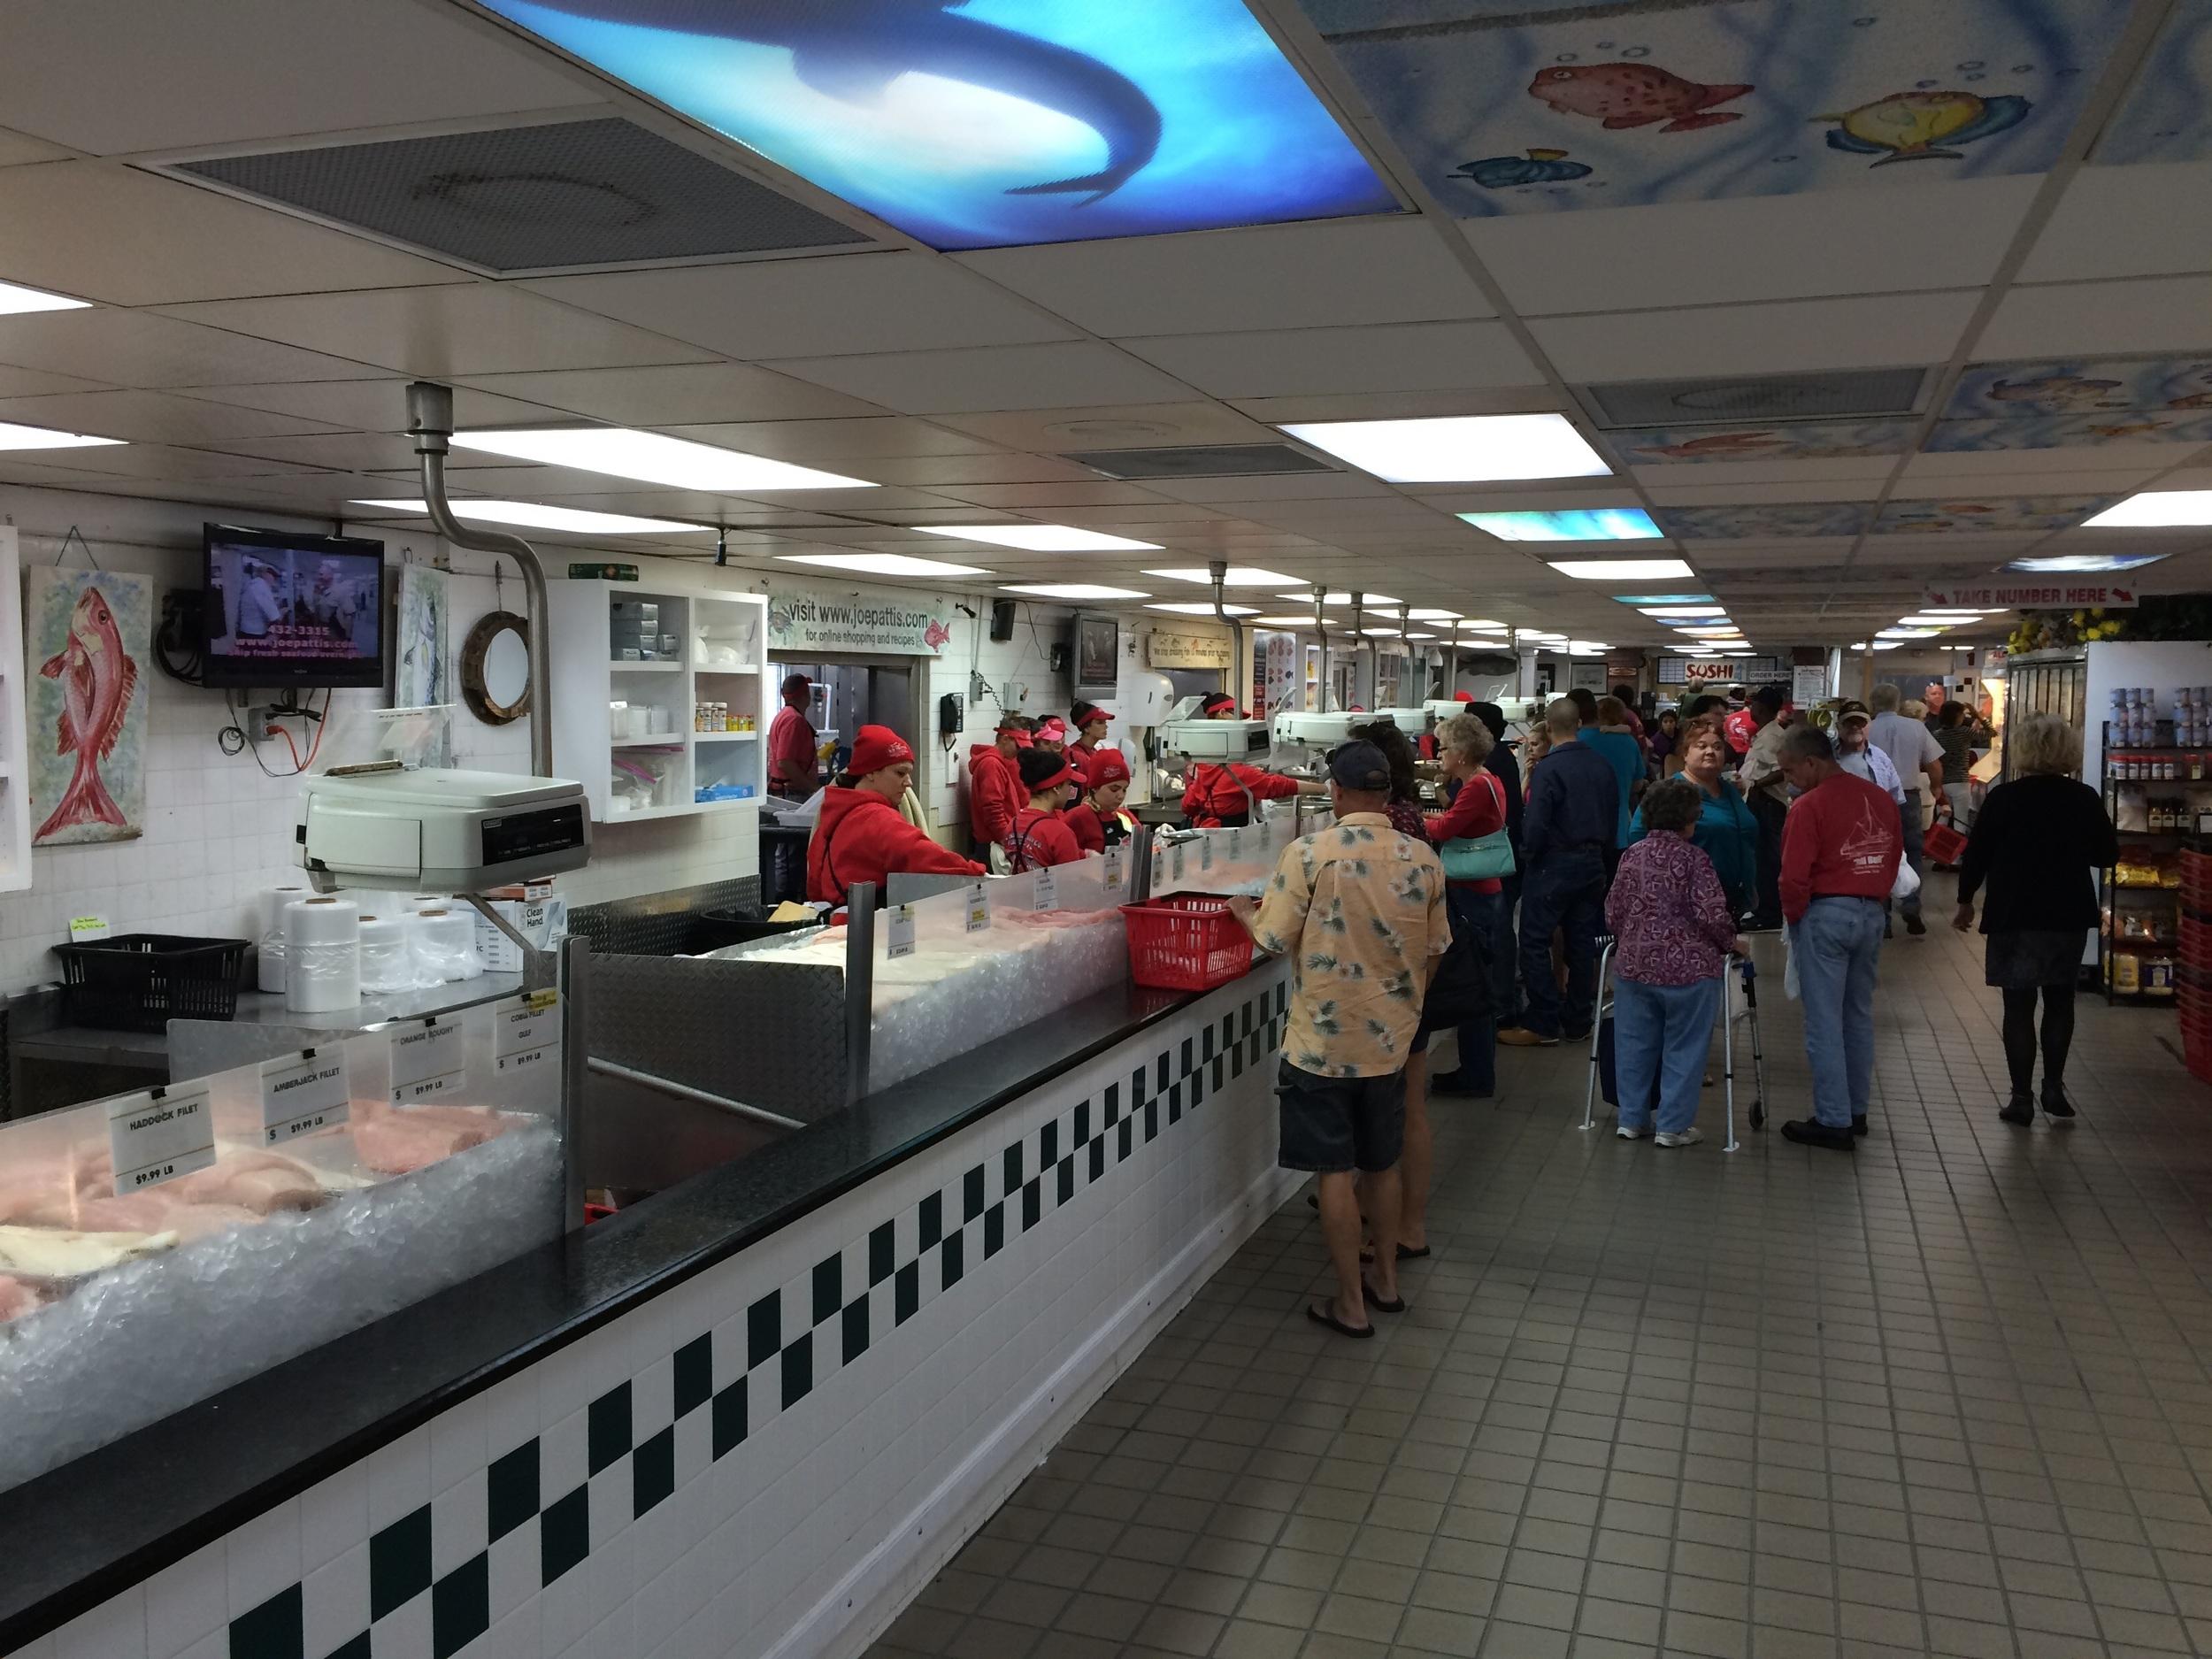 Joe Patti's - Pensacola, Florida